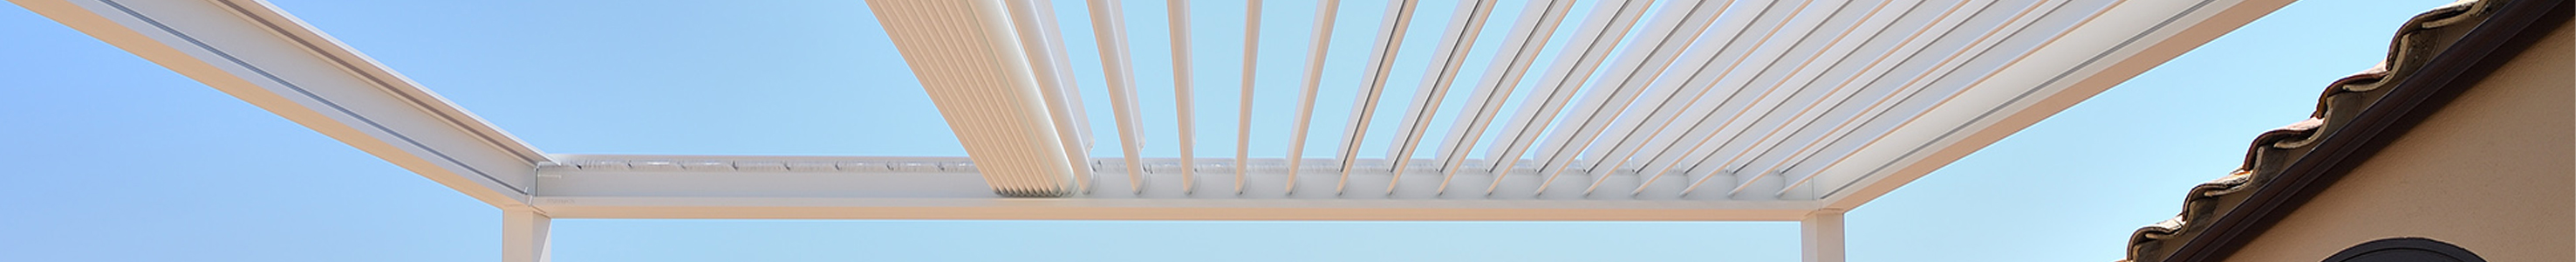 Terrassenueberdachung_Brustor-B600